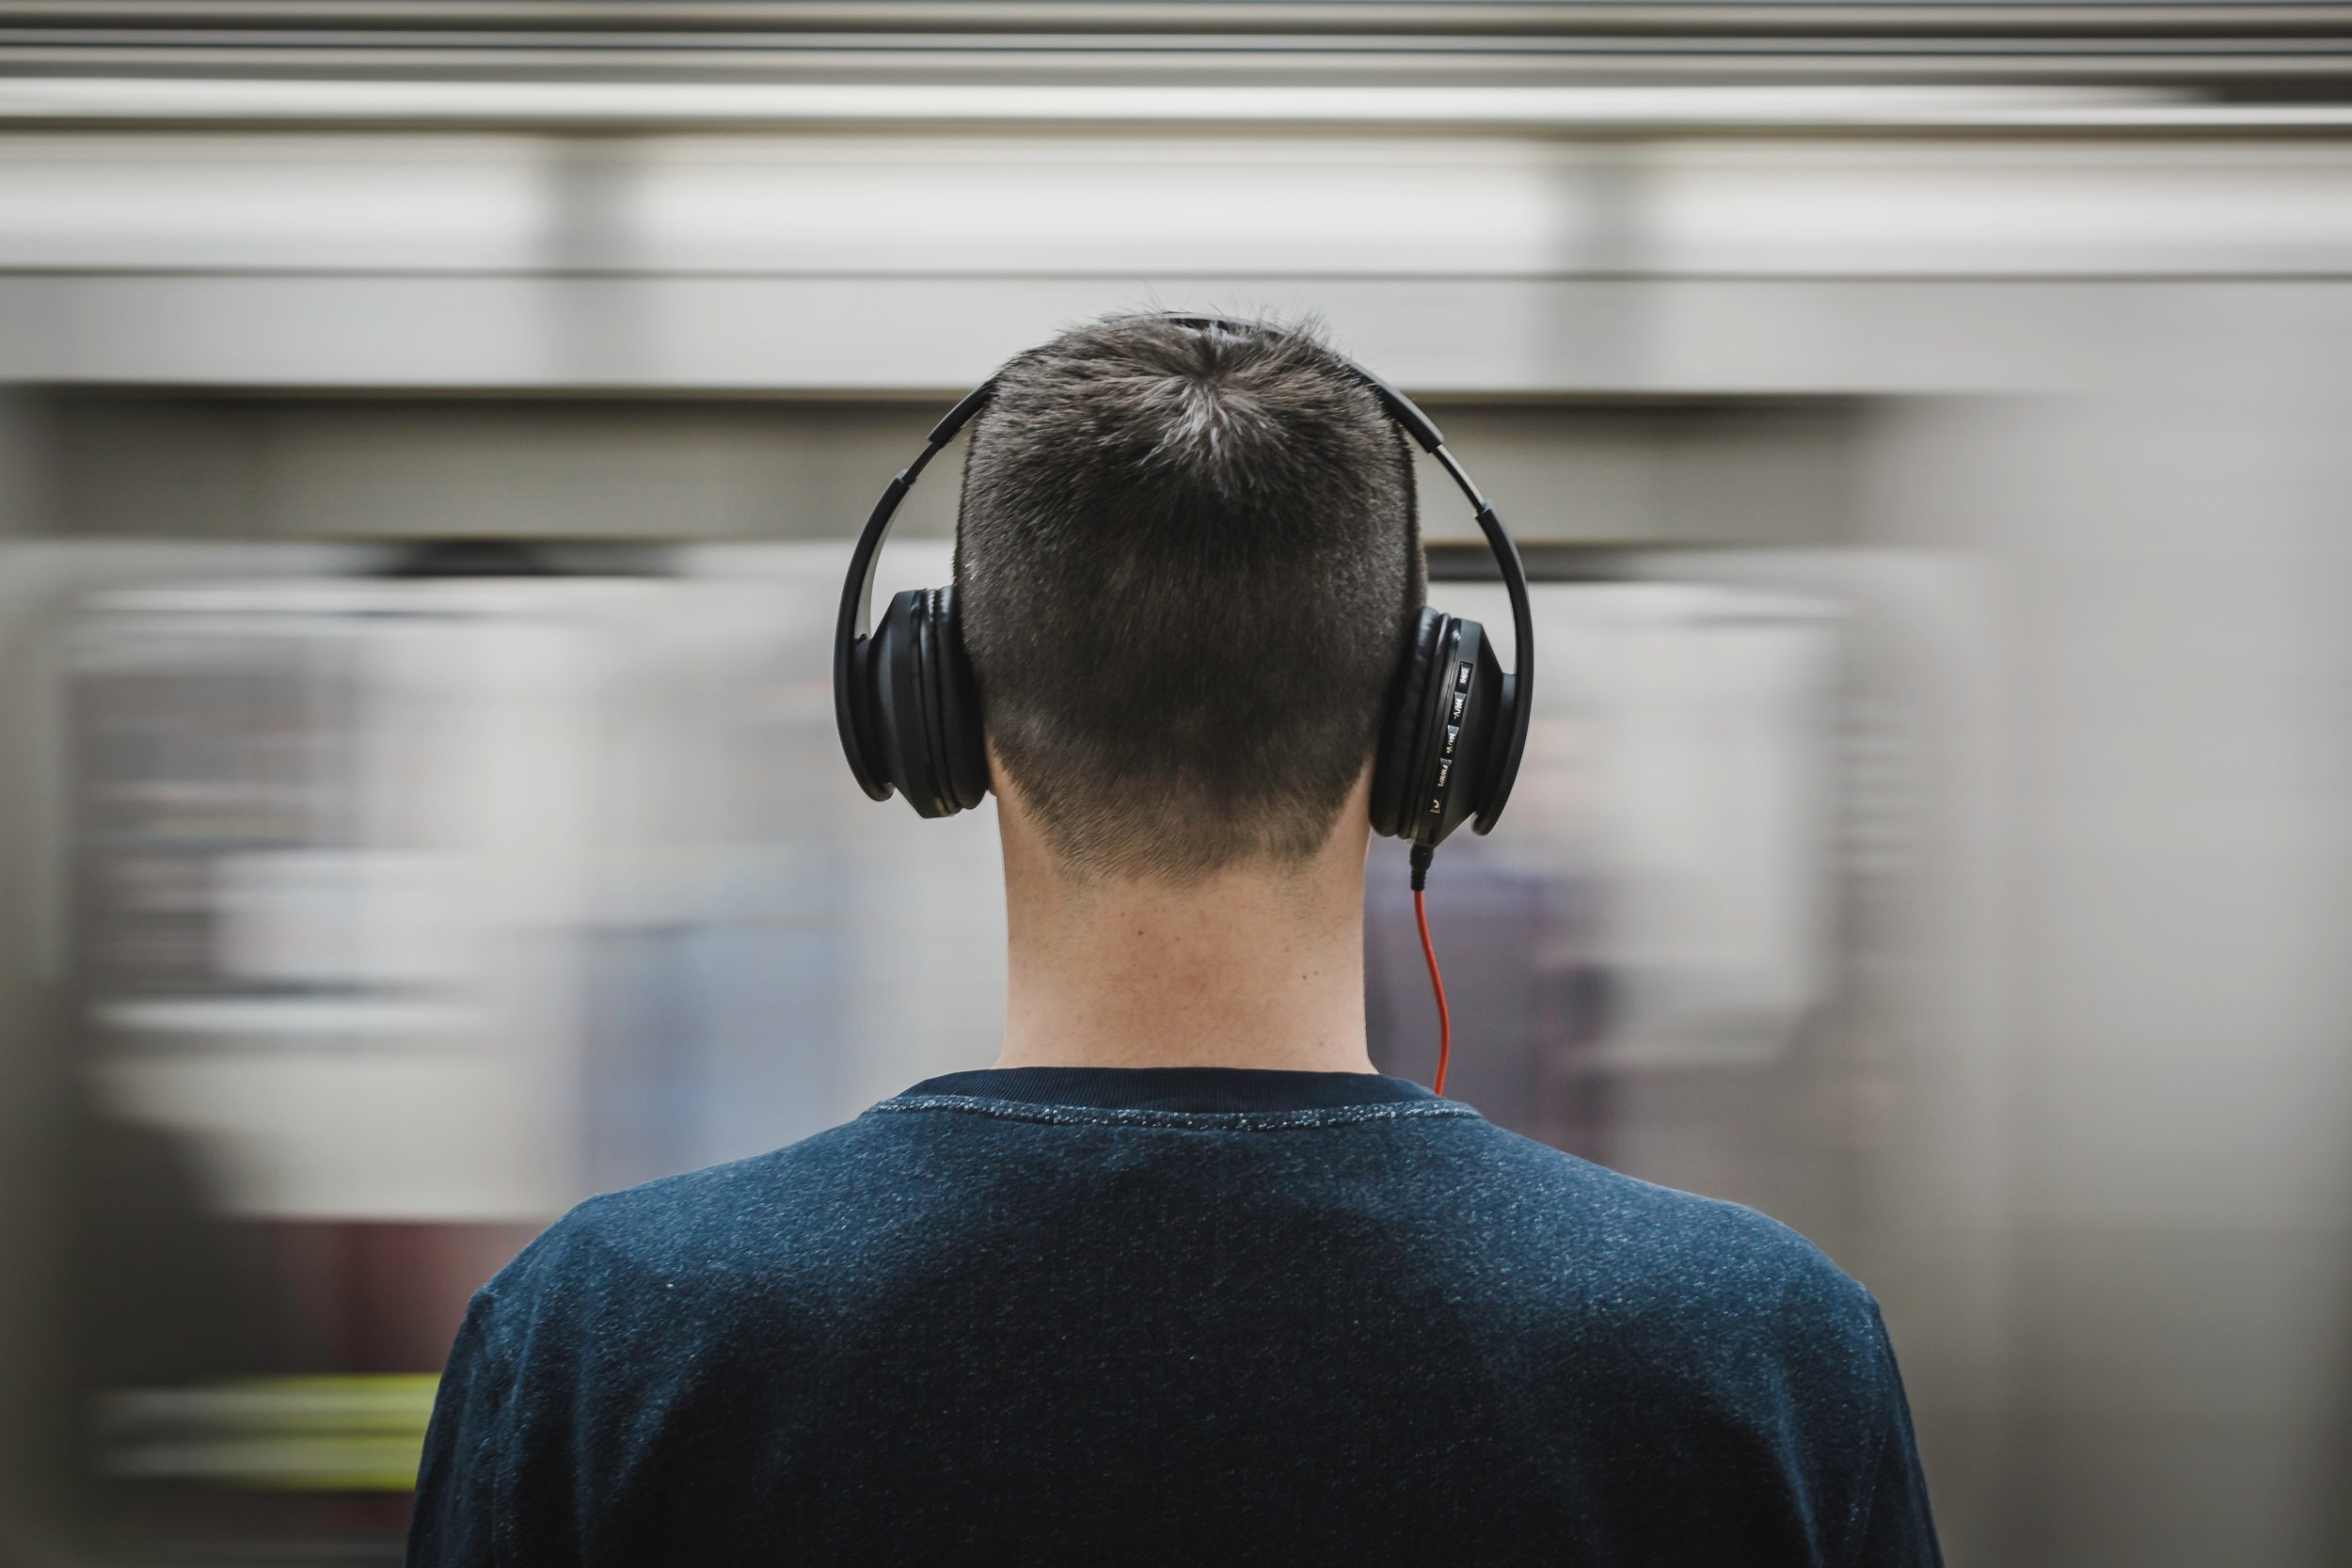 headphones-man-music-fox-and-falcon.jpg